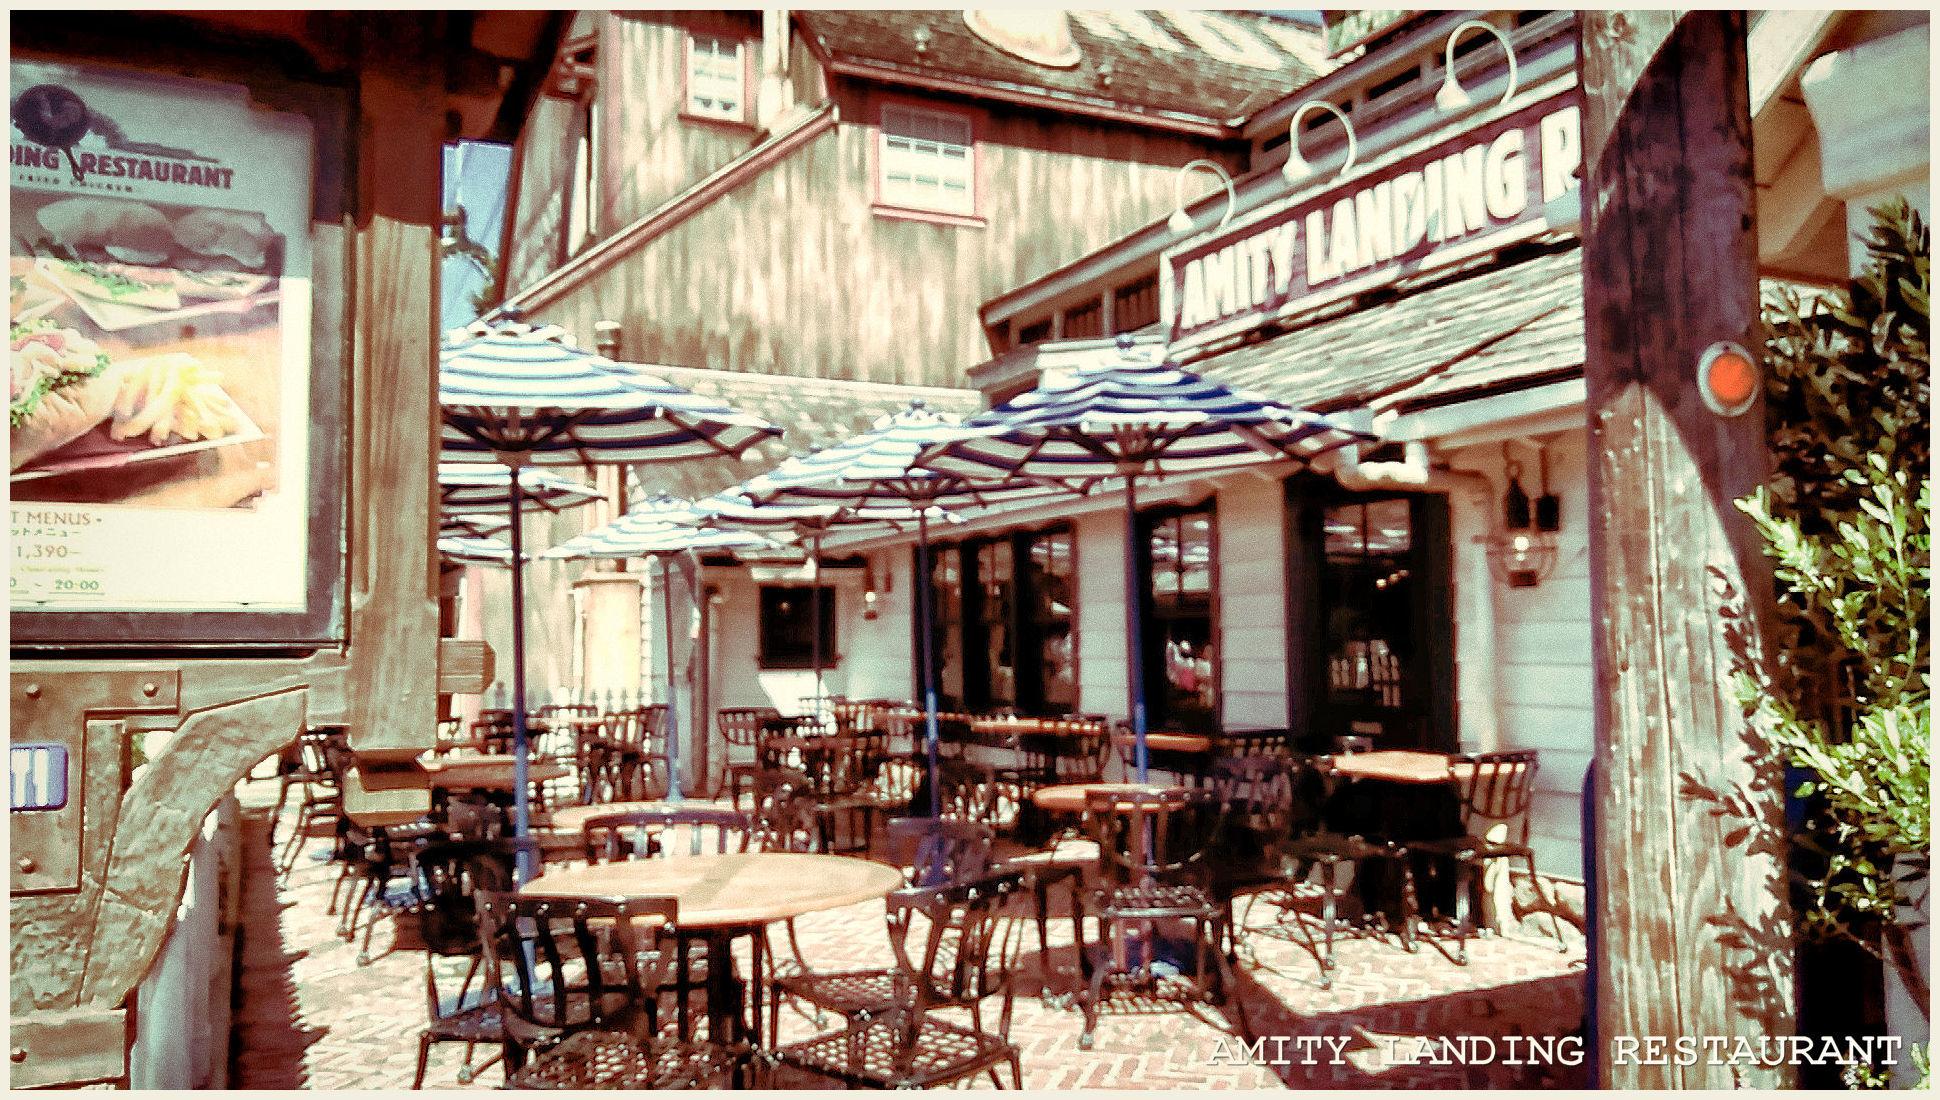 Amity Landing Restaurant_4_ps